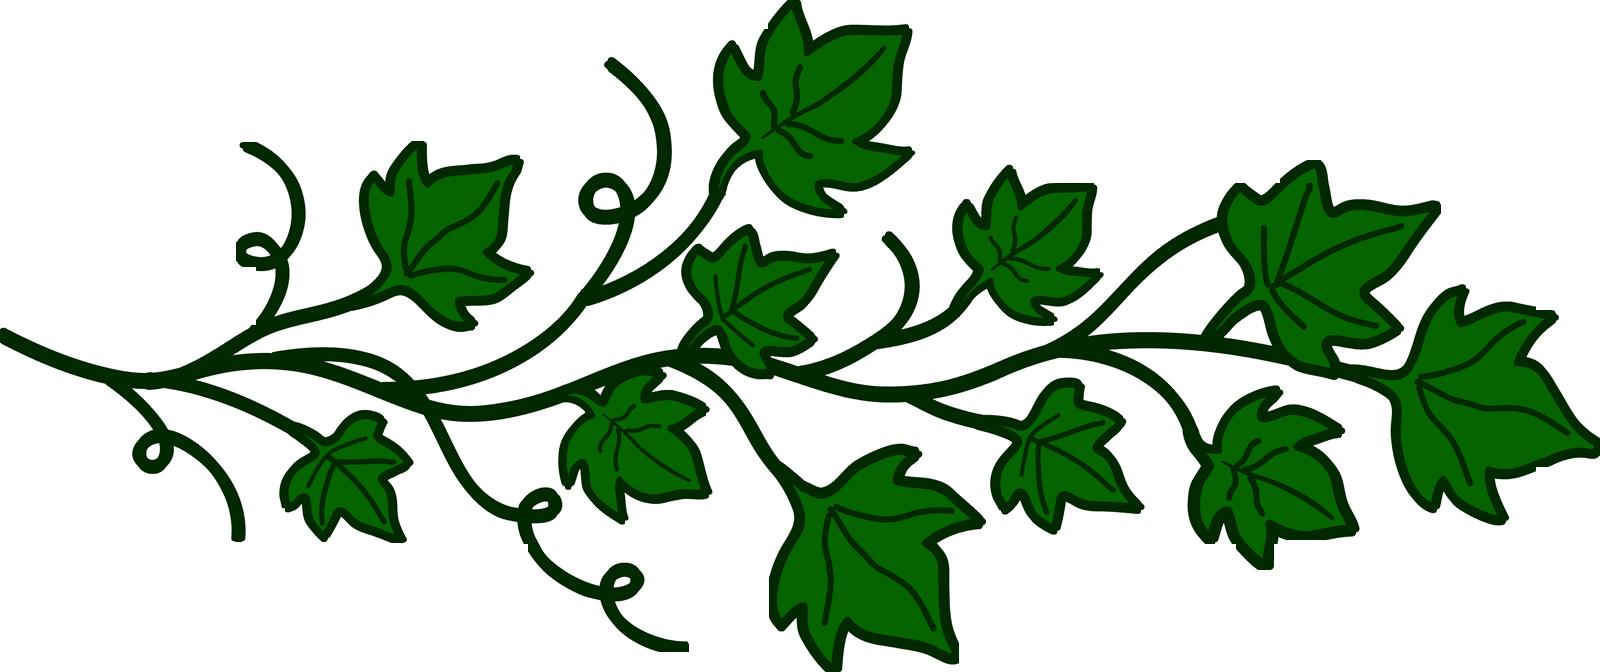 Vine images clipart vector freeuse stock Free Vine Cliparts Transparent, Download Free Clip Art, Free Clip ... vector freeuse stock